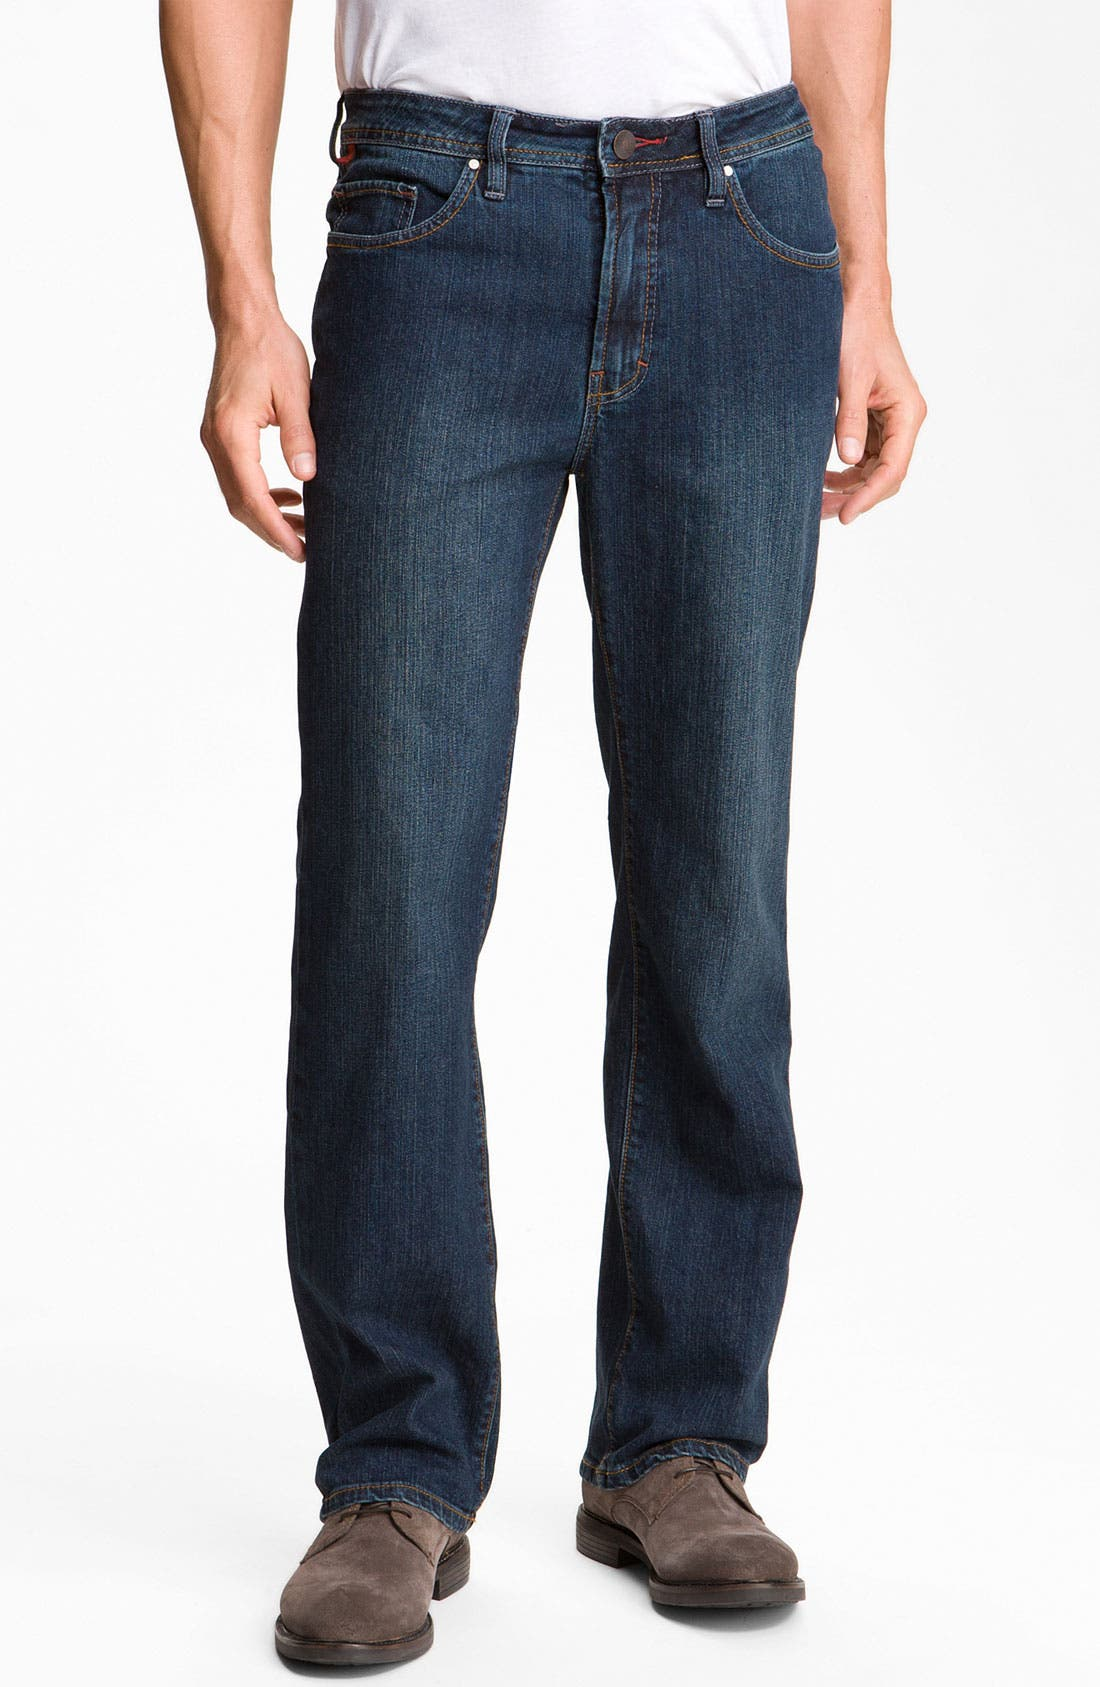 Main Image - Worn Jeans 'Octane' Straight Leg Jeans (Clean Dark)